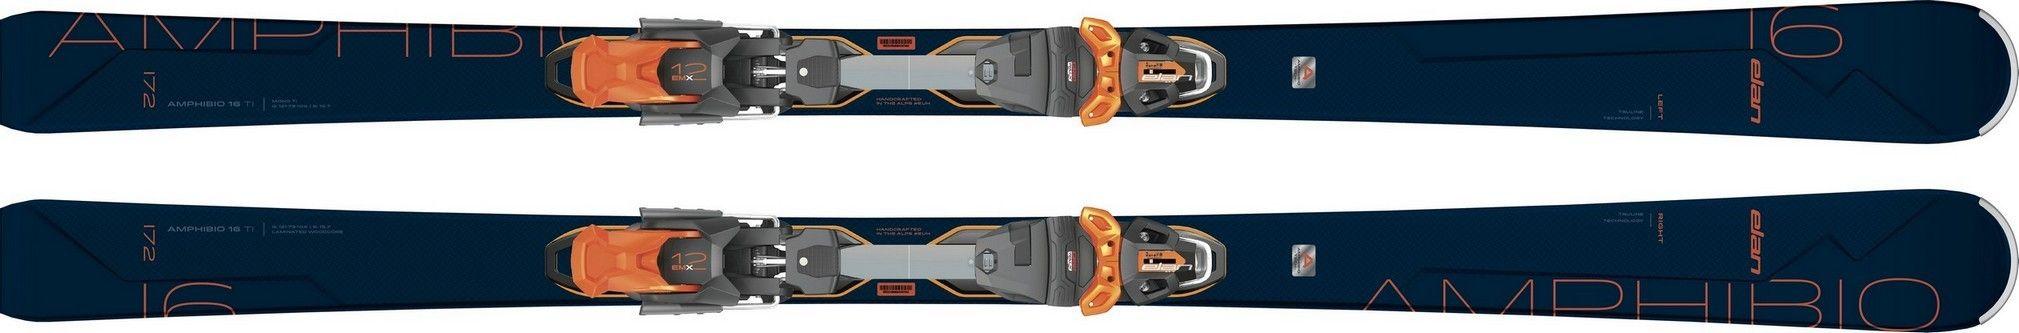 AMPHIBIO 16 Ti Fusion X